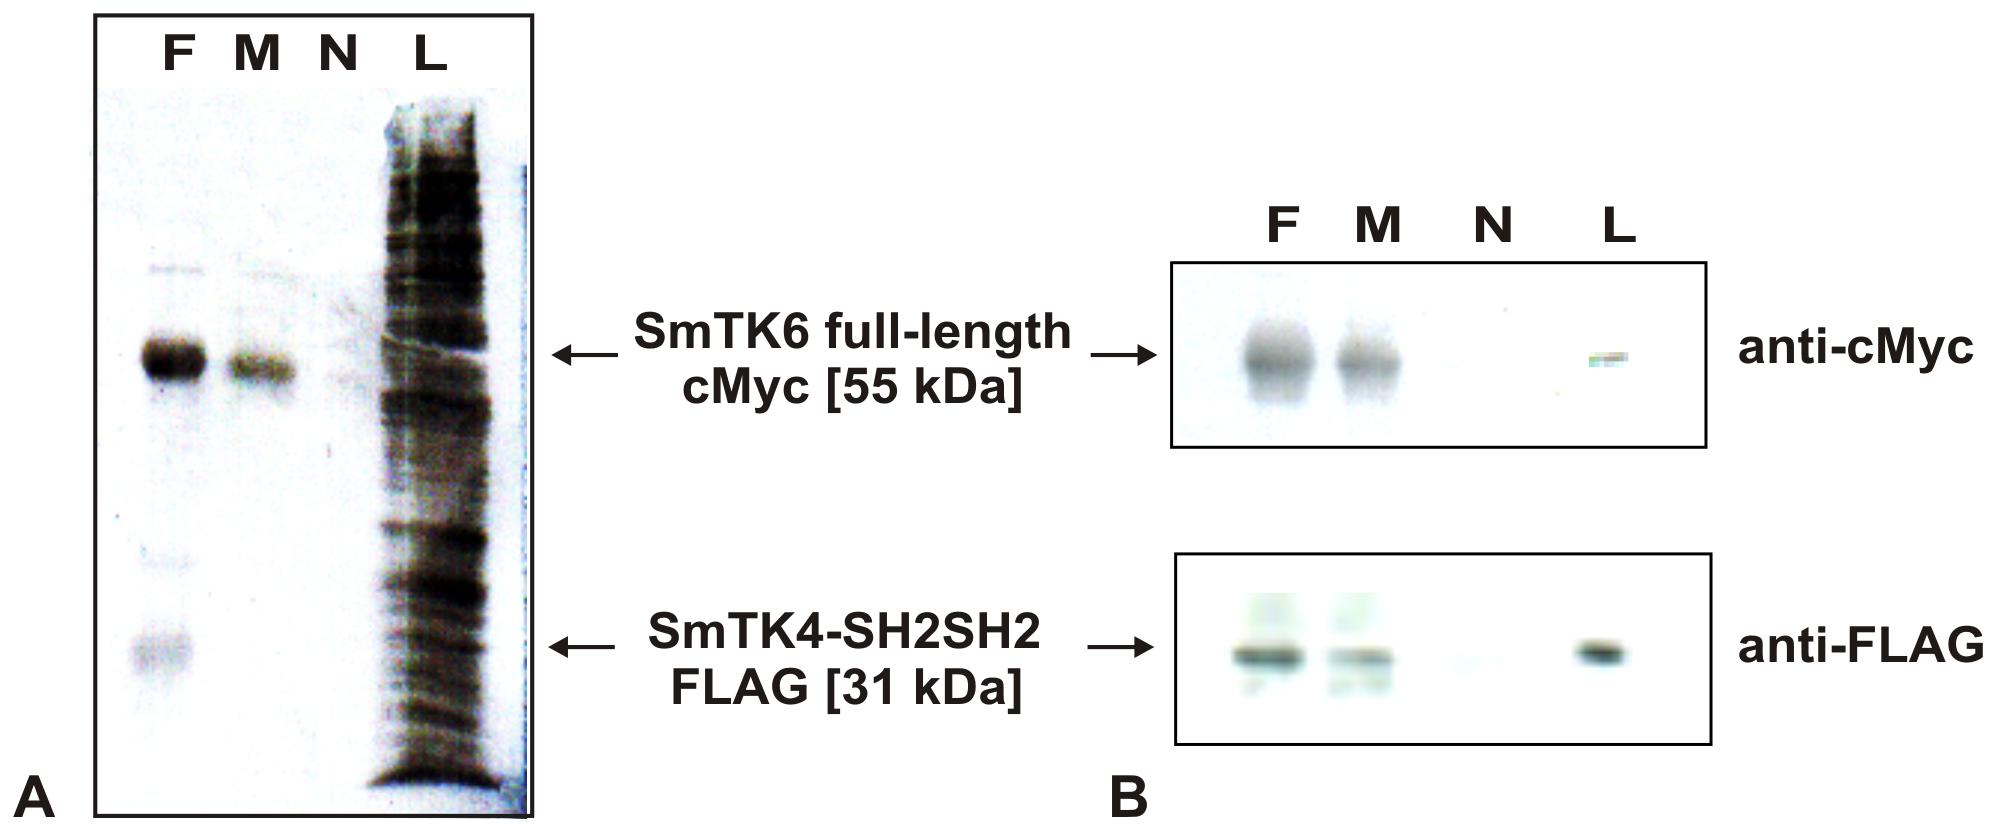 Co-immunoprecipitation of SmTK4 and SmTK6.